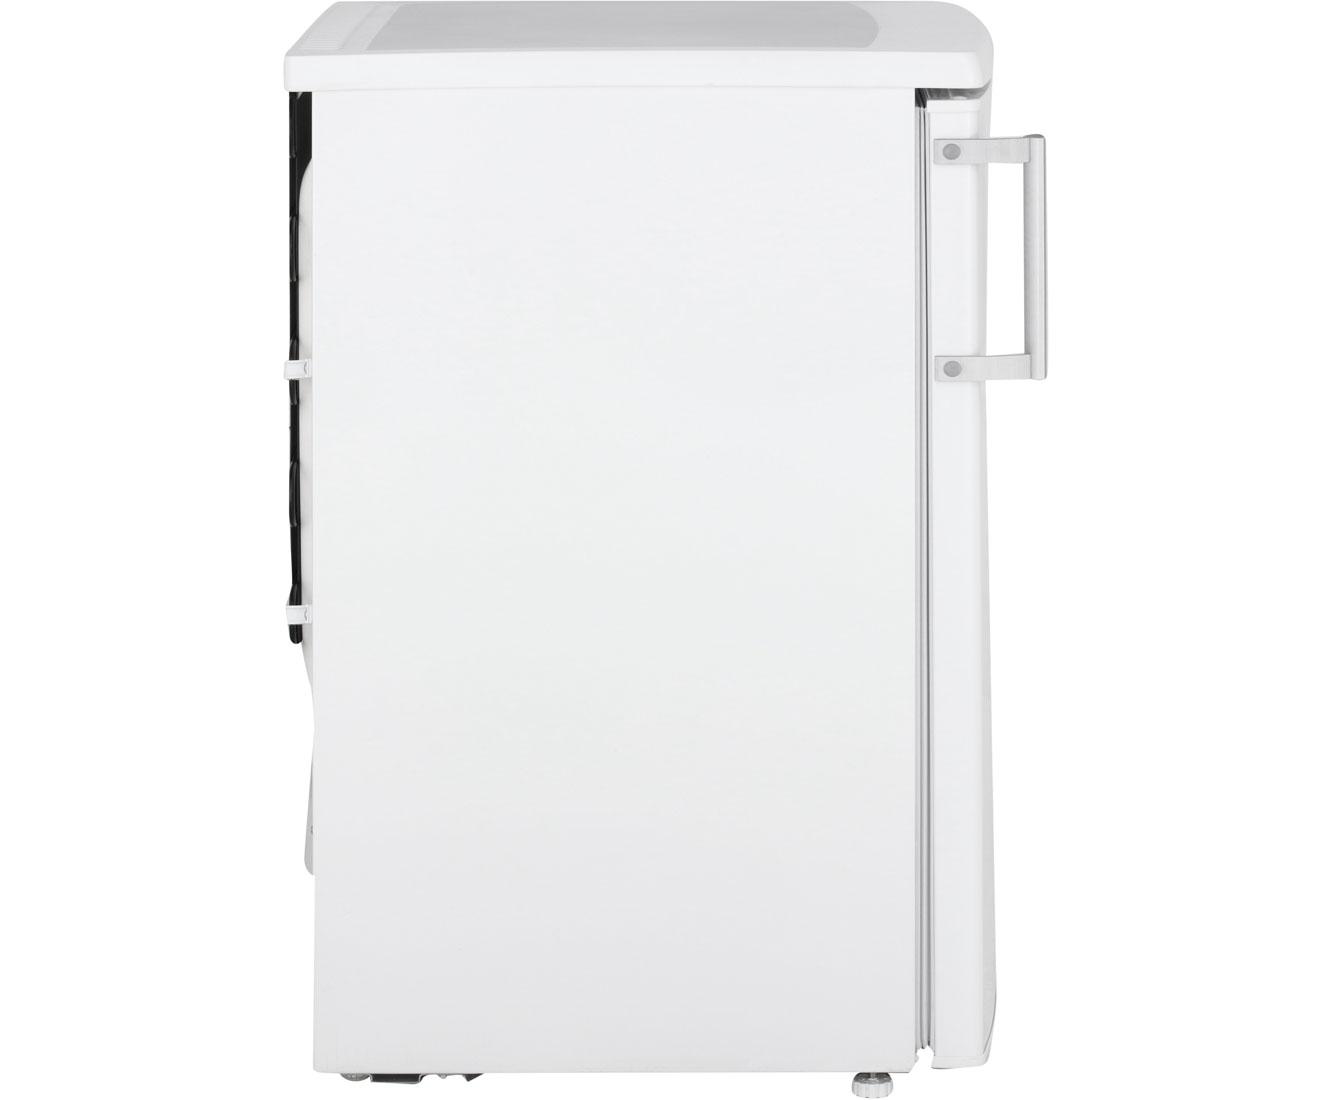 Amica Kühlschrank Ks 15453 : Amica ks w kühlschrank mit gefrierfach weiß a